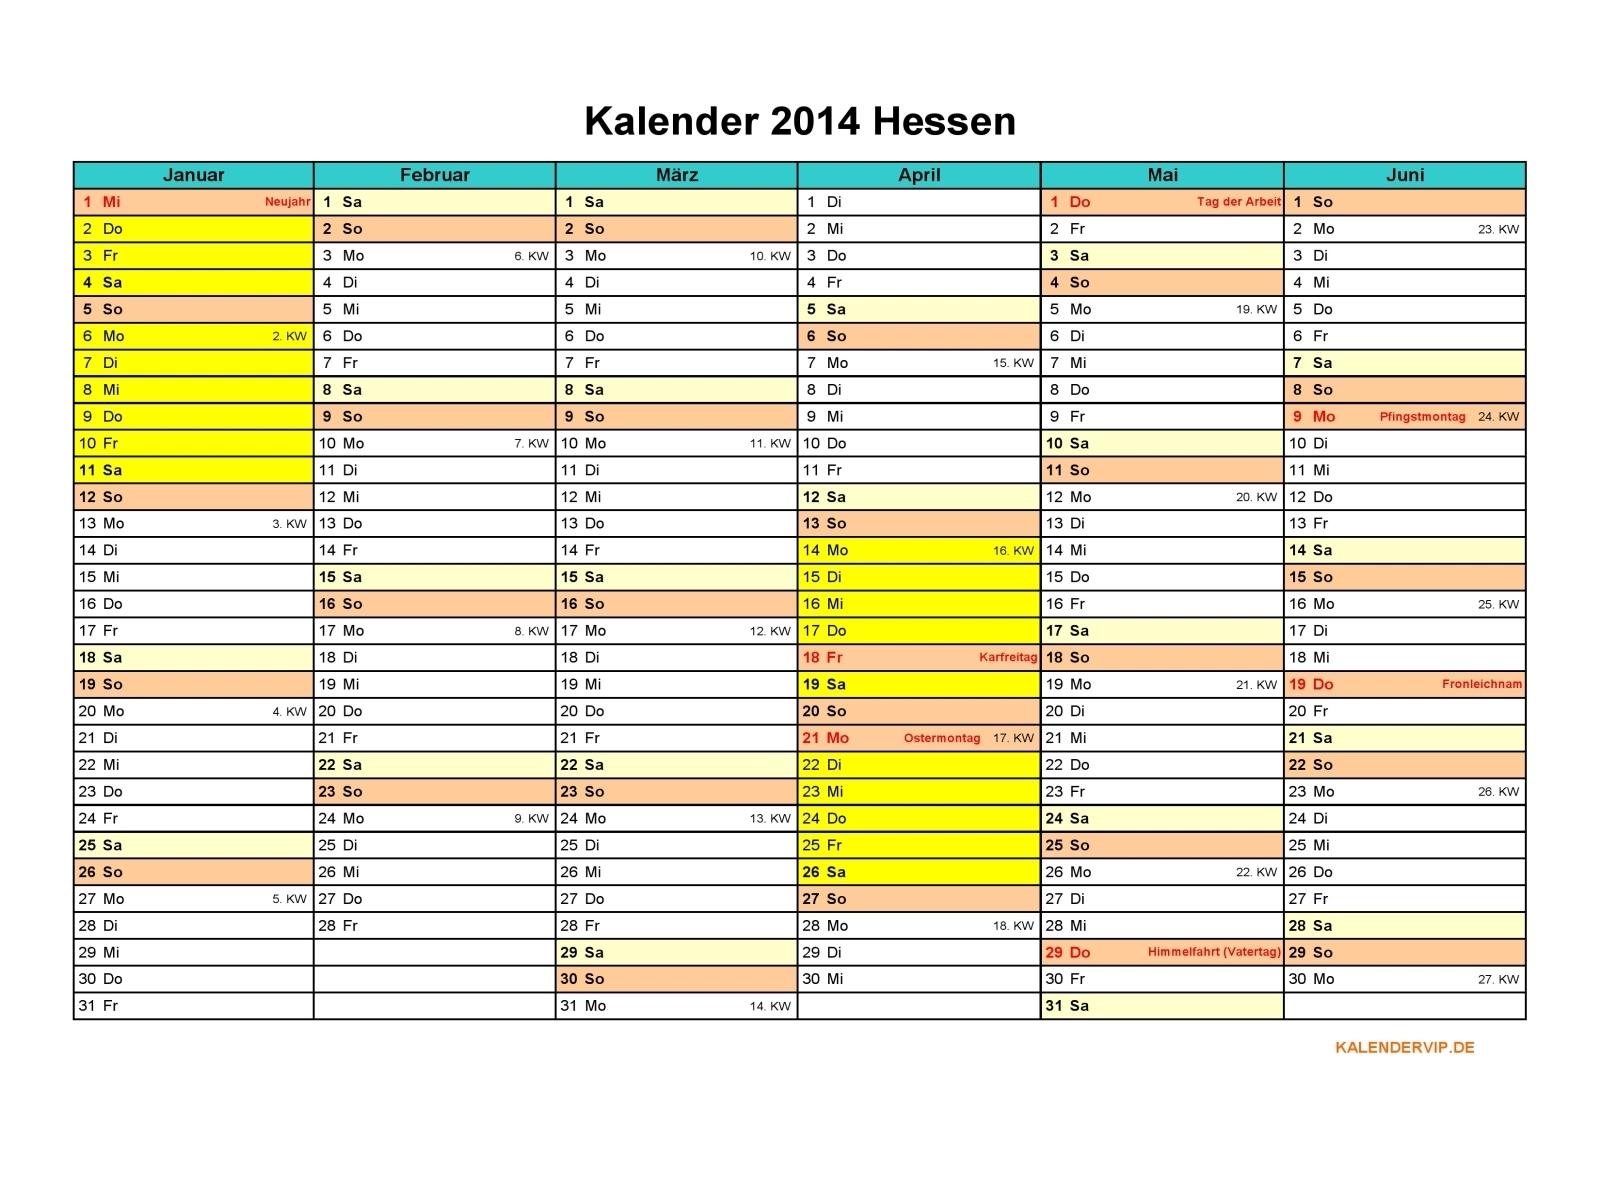 Kalender 2014 Hessen - KalenderVIP